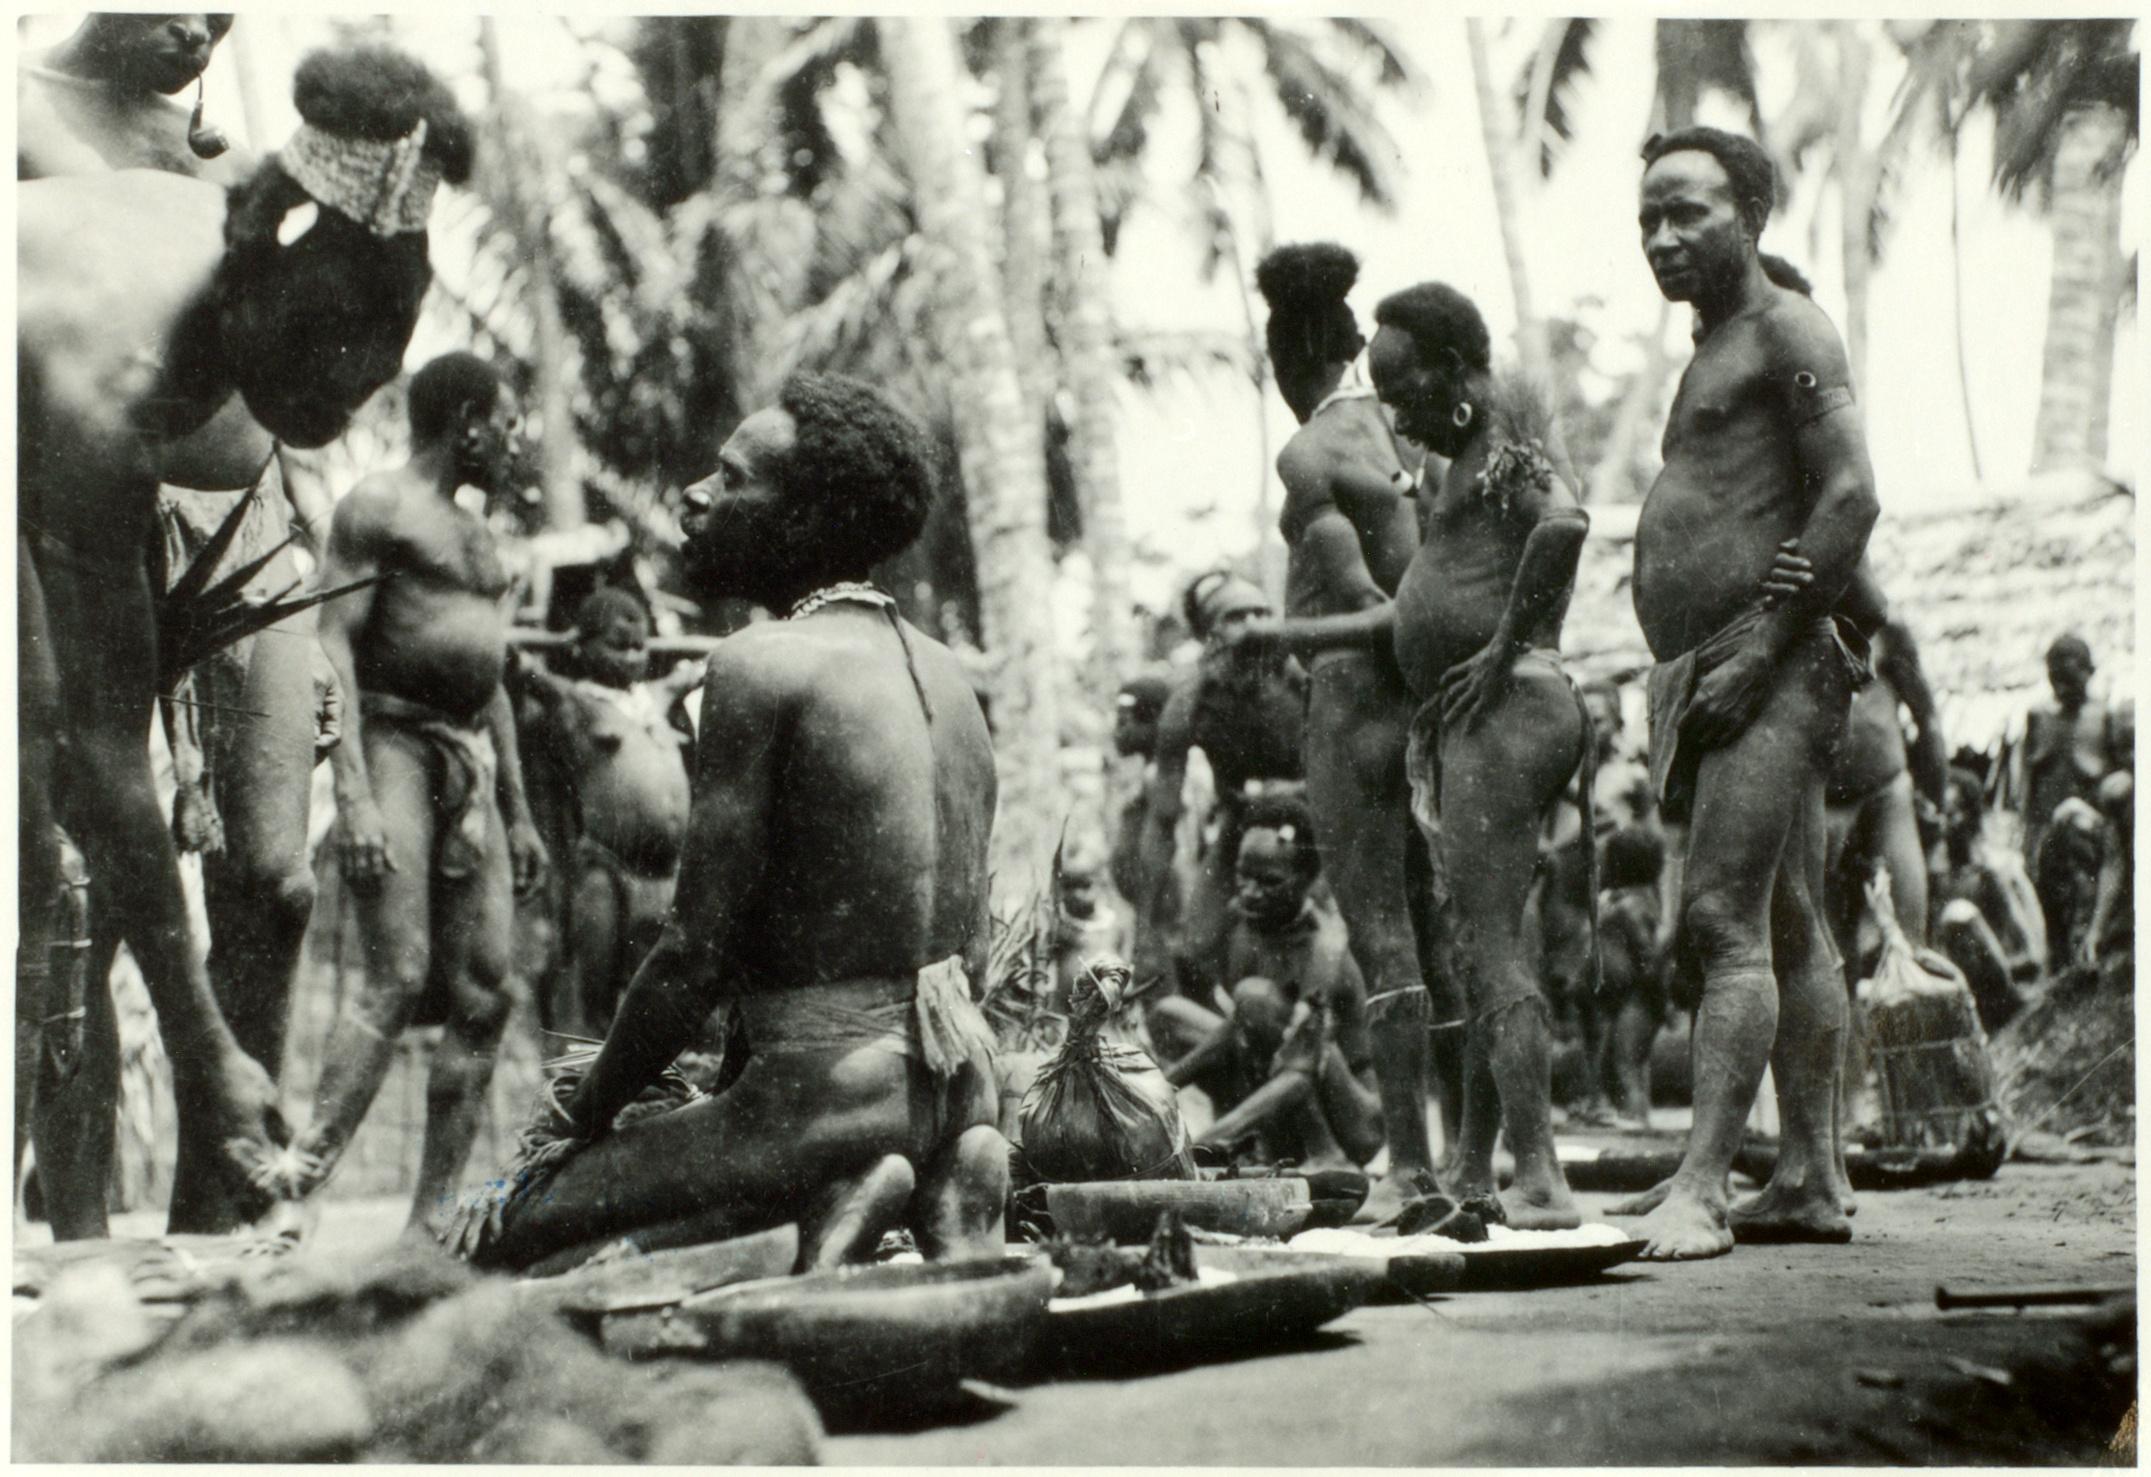 Study of the arapesh culture